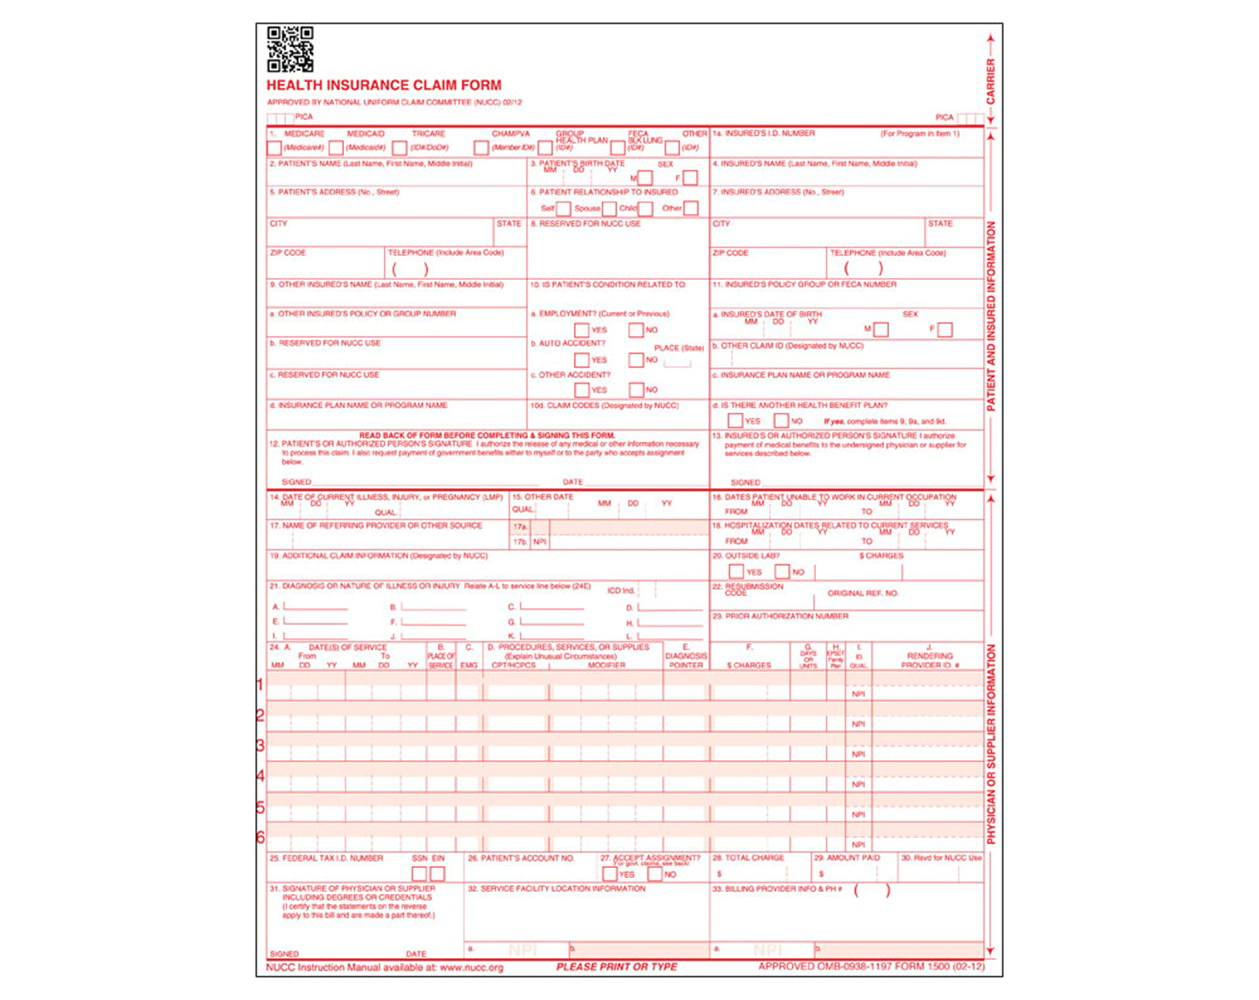 Hcfa Form 1500 Instructions